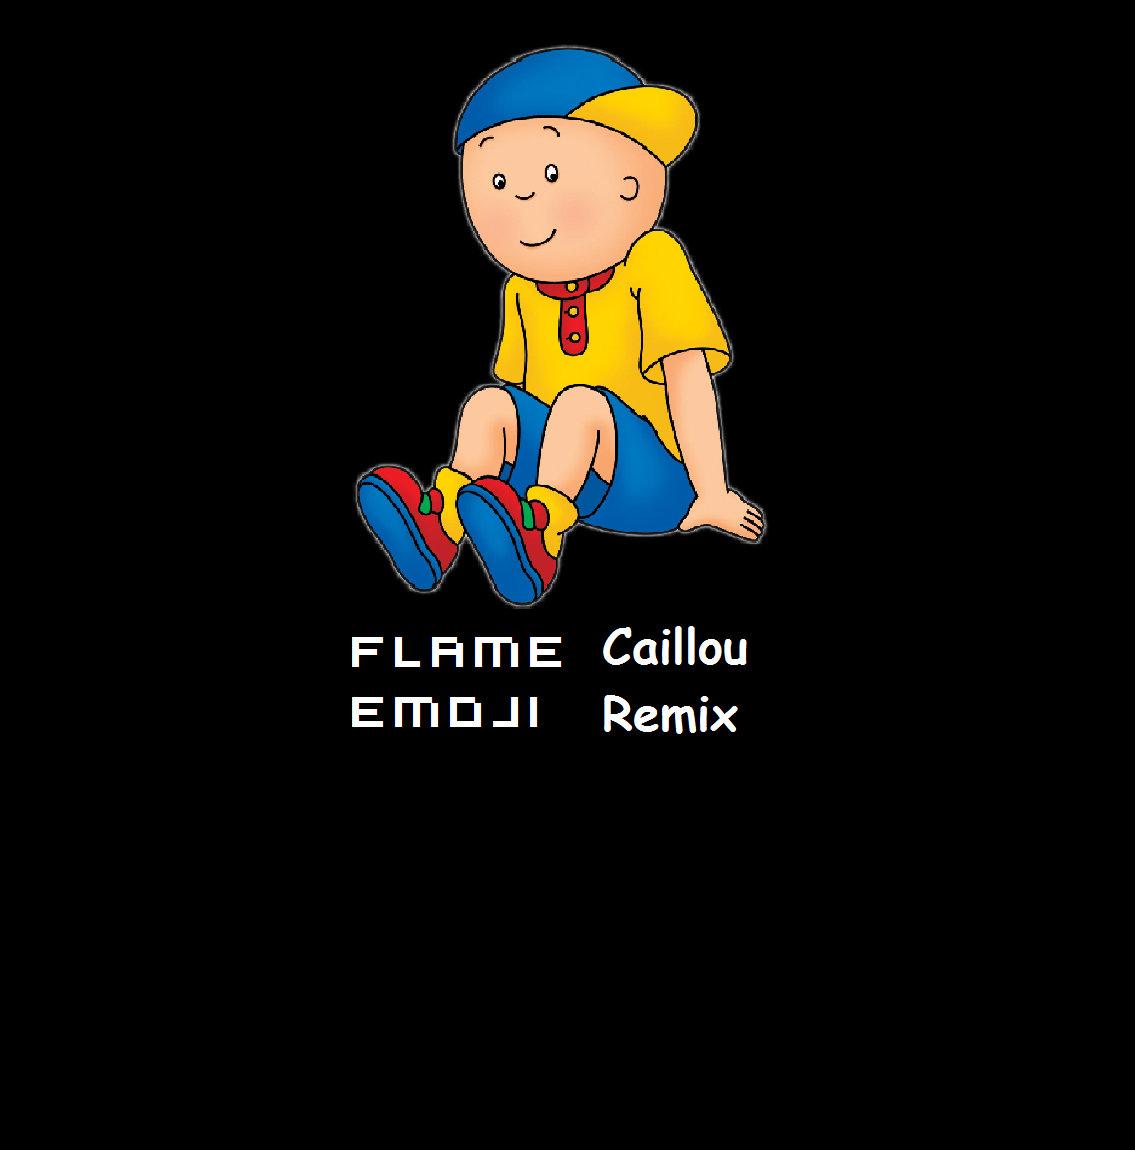 Caillou Remix | Flame Emoji